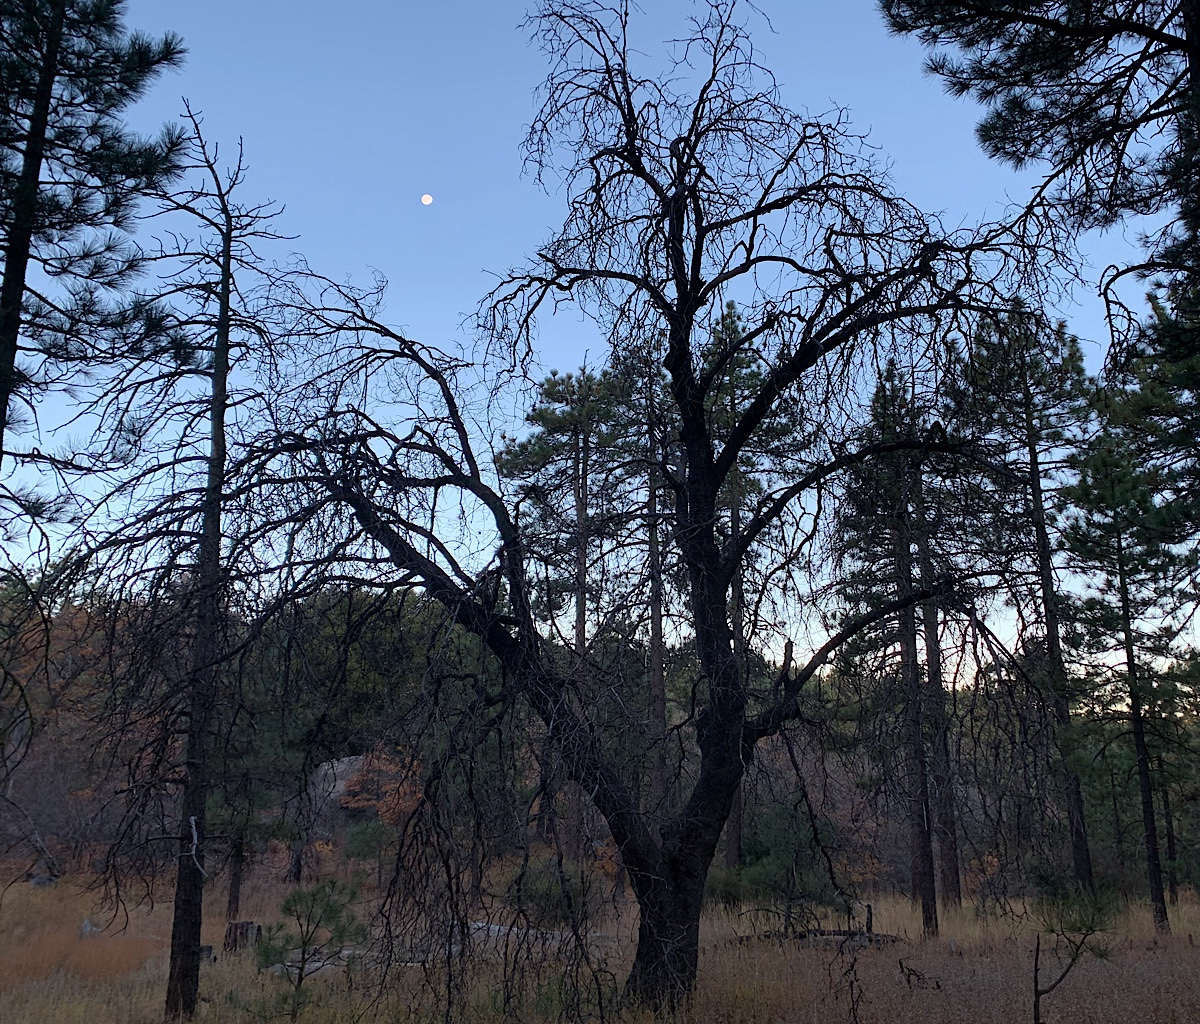 A moon setting above spooky trees on Mount Laguna.